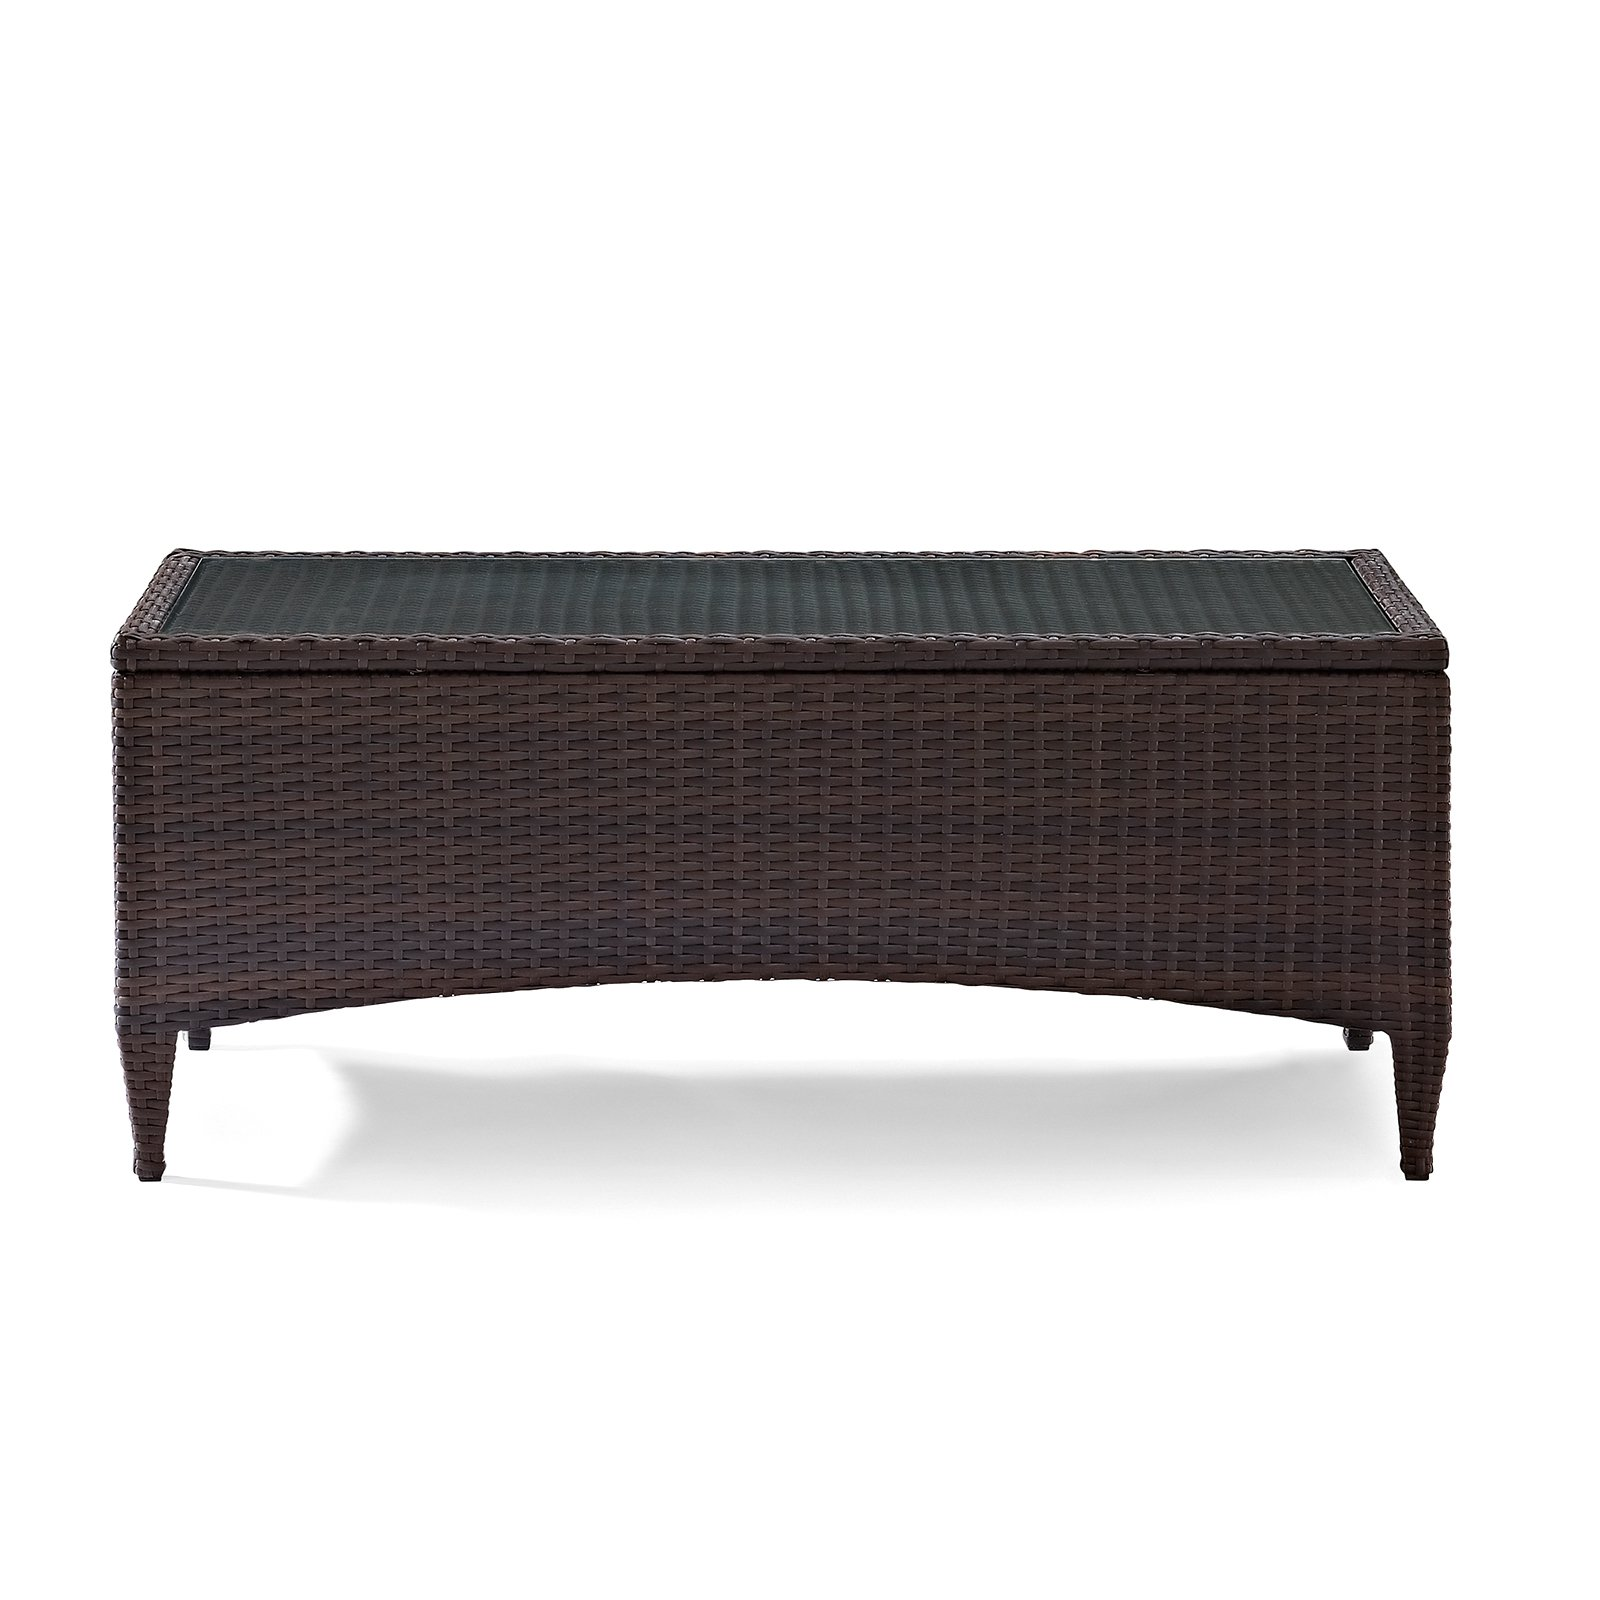 crosley furniture kiawah outdoor wicker glass top table walmart com rh walmart com